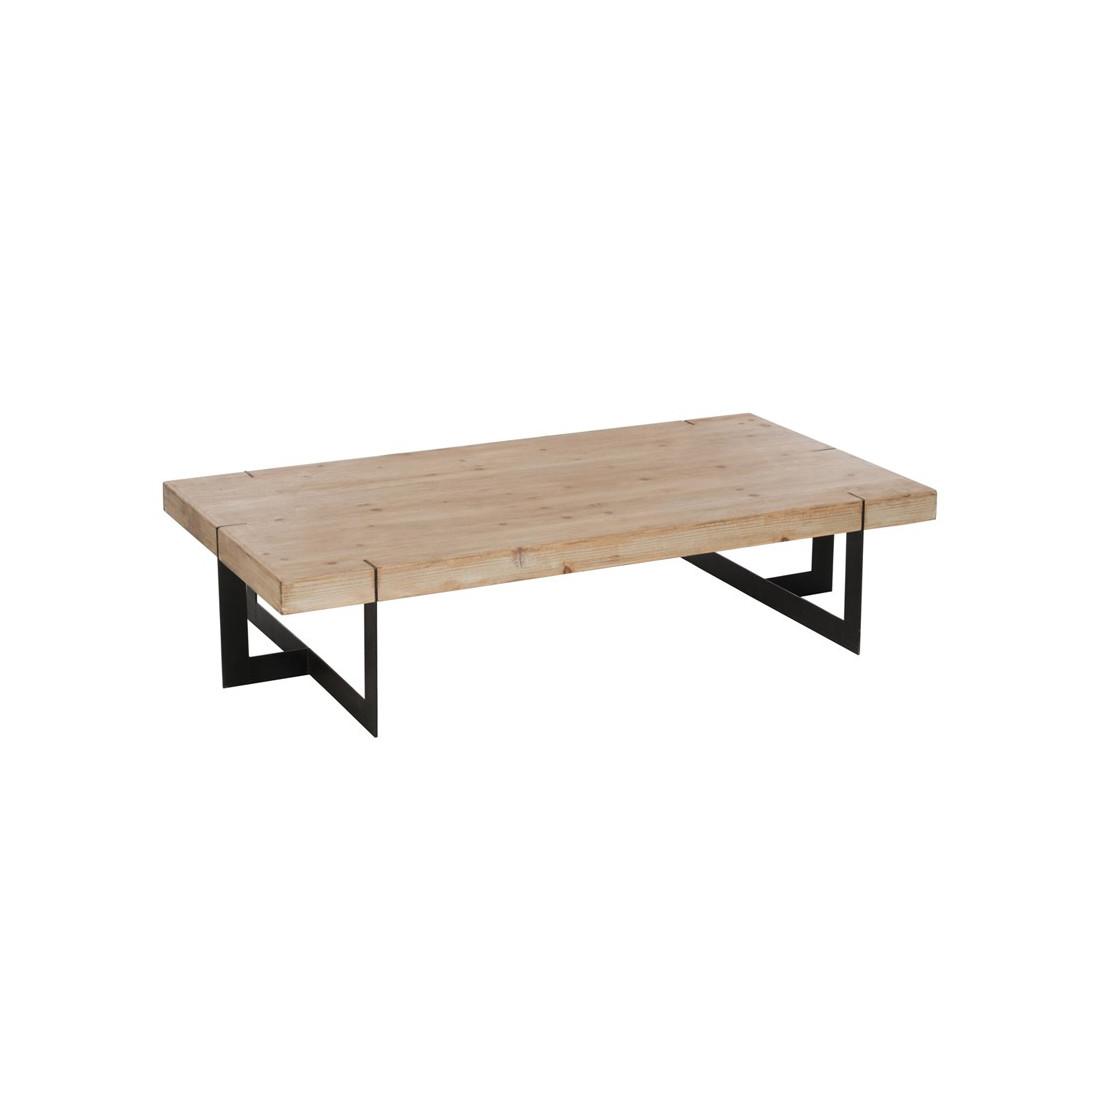 Table basse moderne design grande dimension helphie for Table cuisine 80 x 80